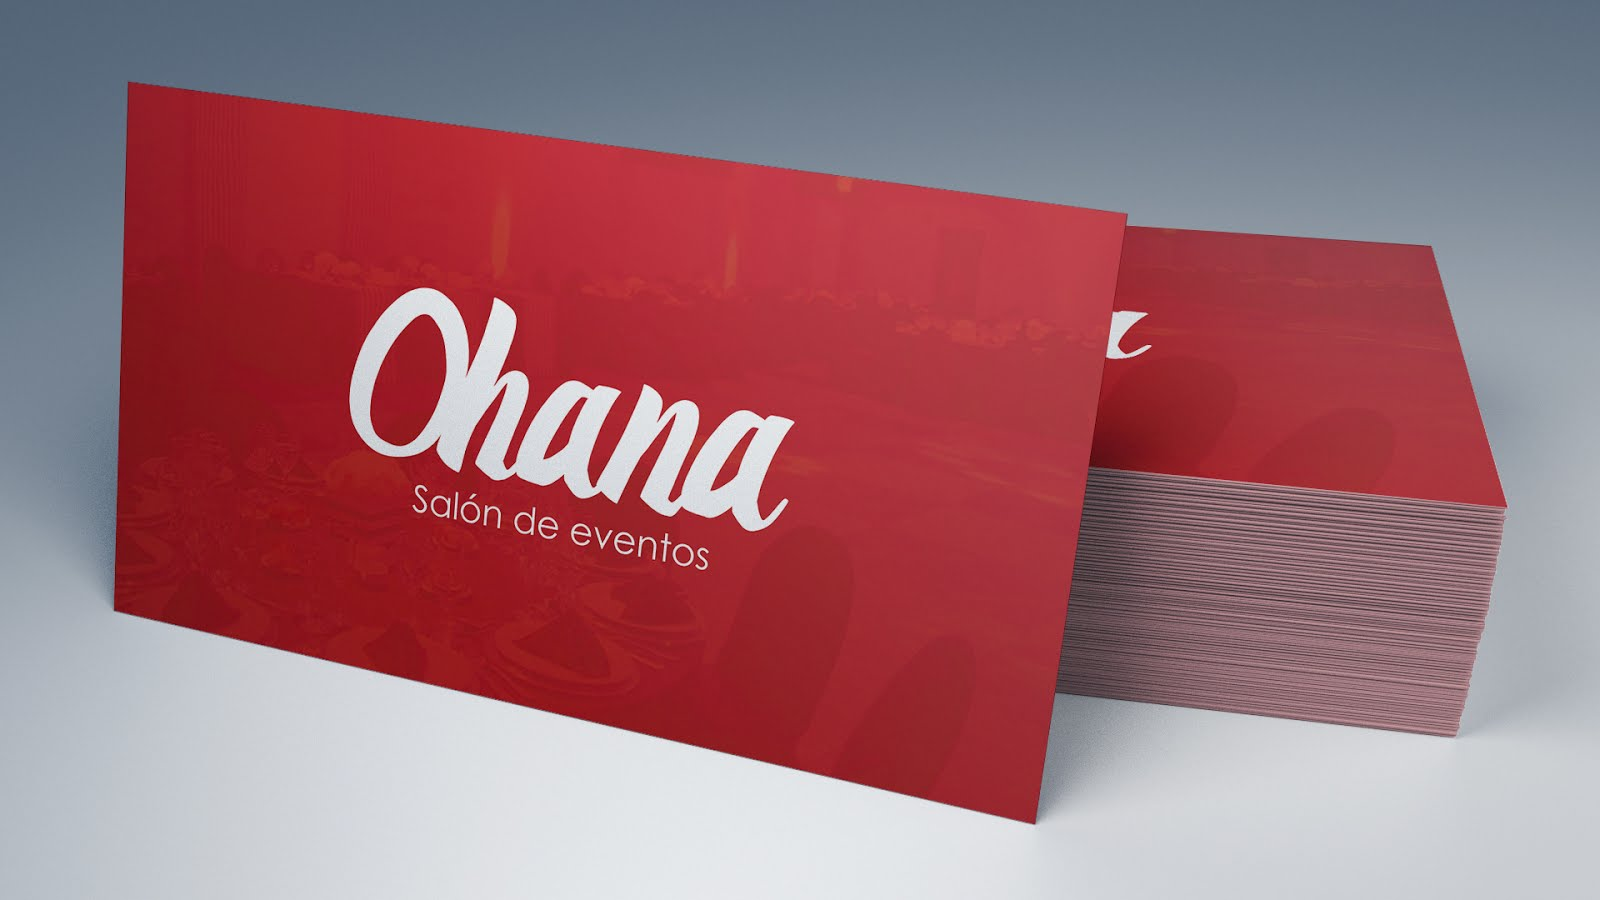 Tarjetas Personales - Ohana